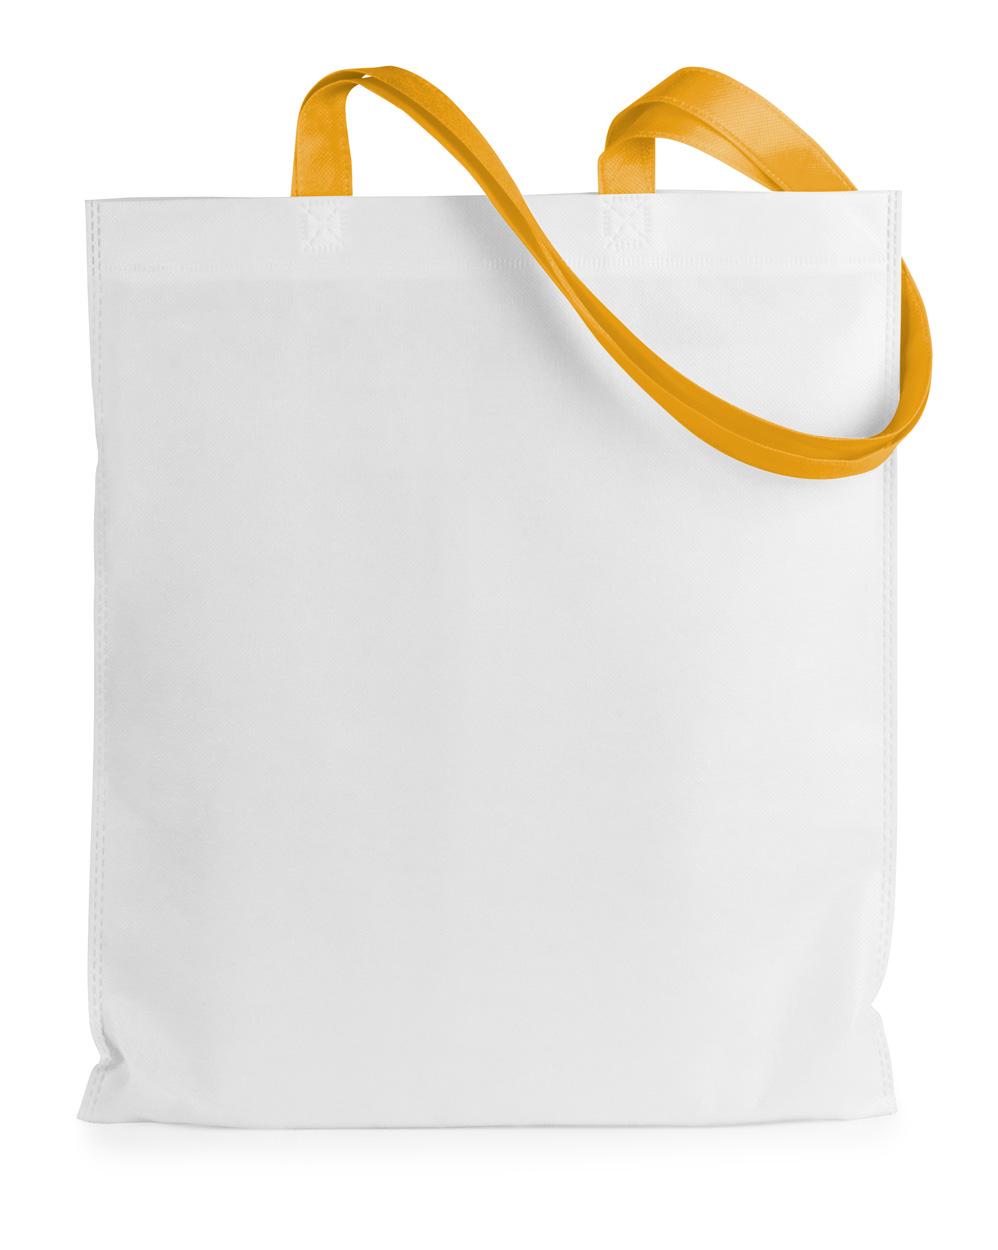 Rambla shopping bag